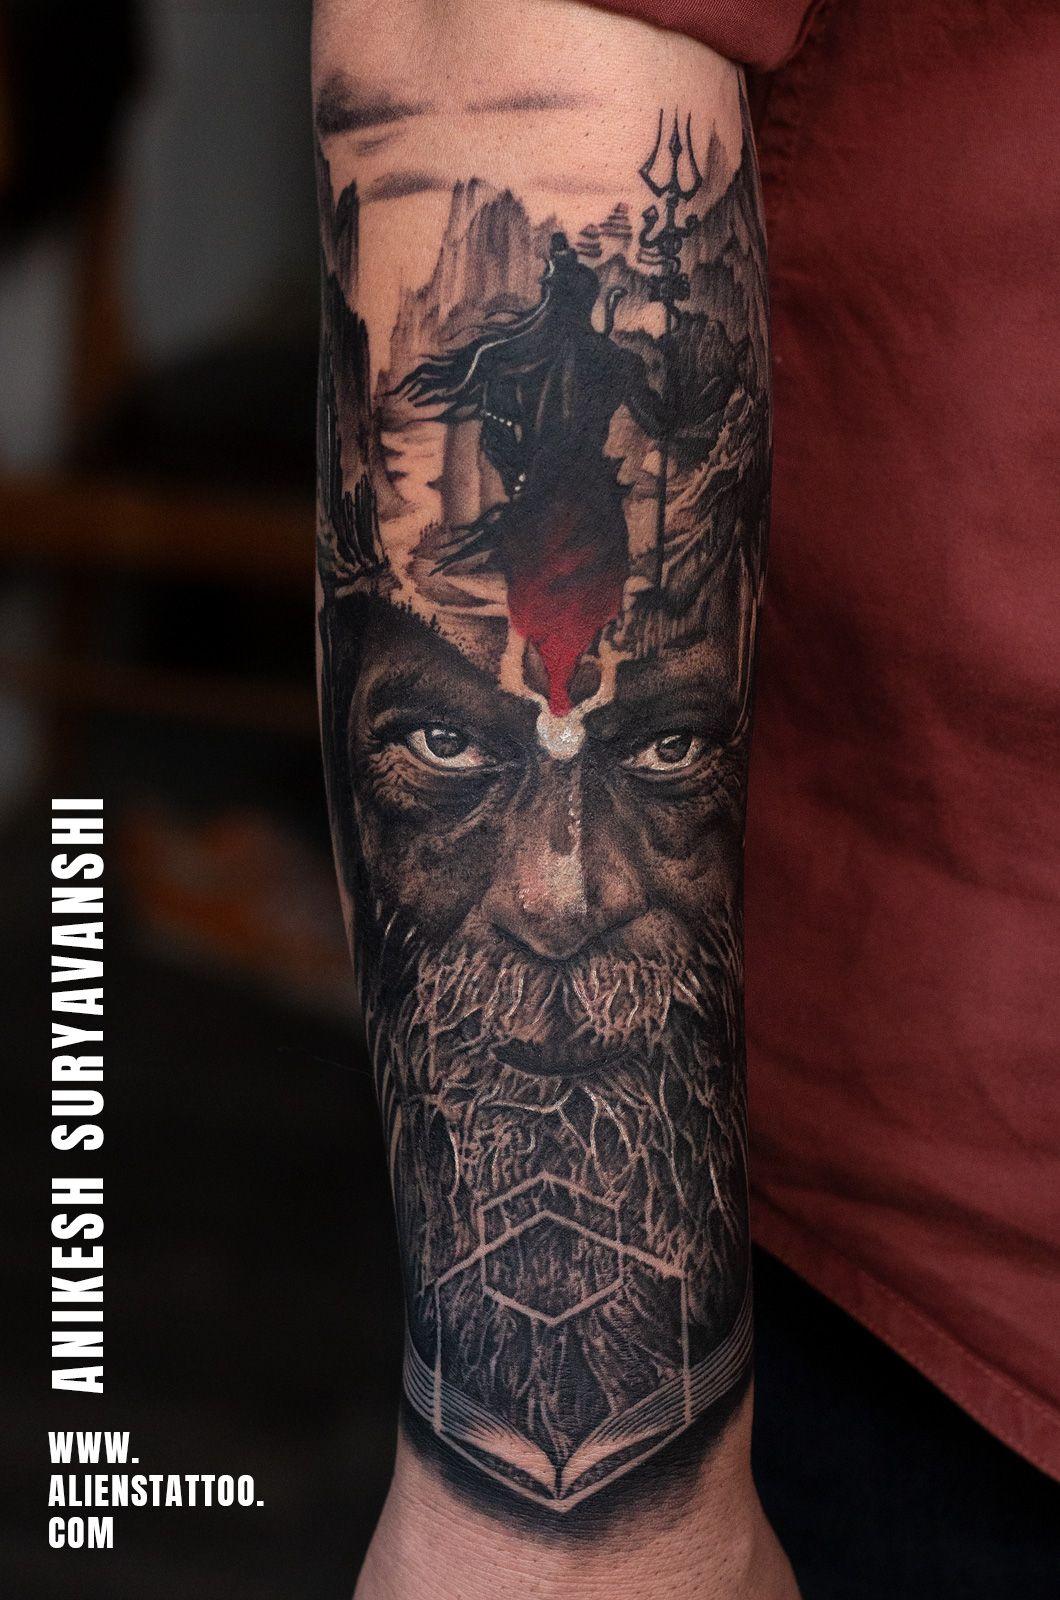 Anikesh suryavanshi alien tattoo tattoos for guys